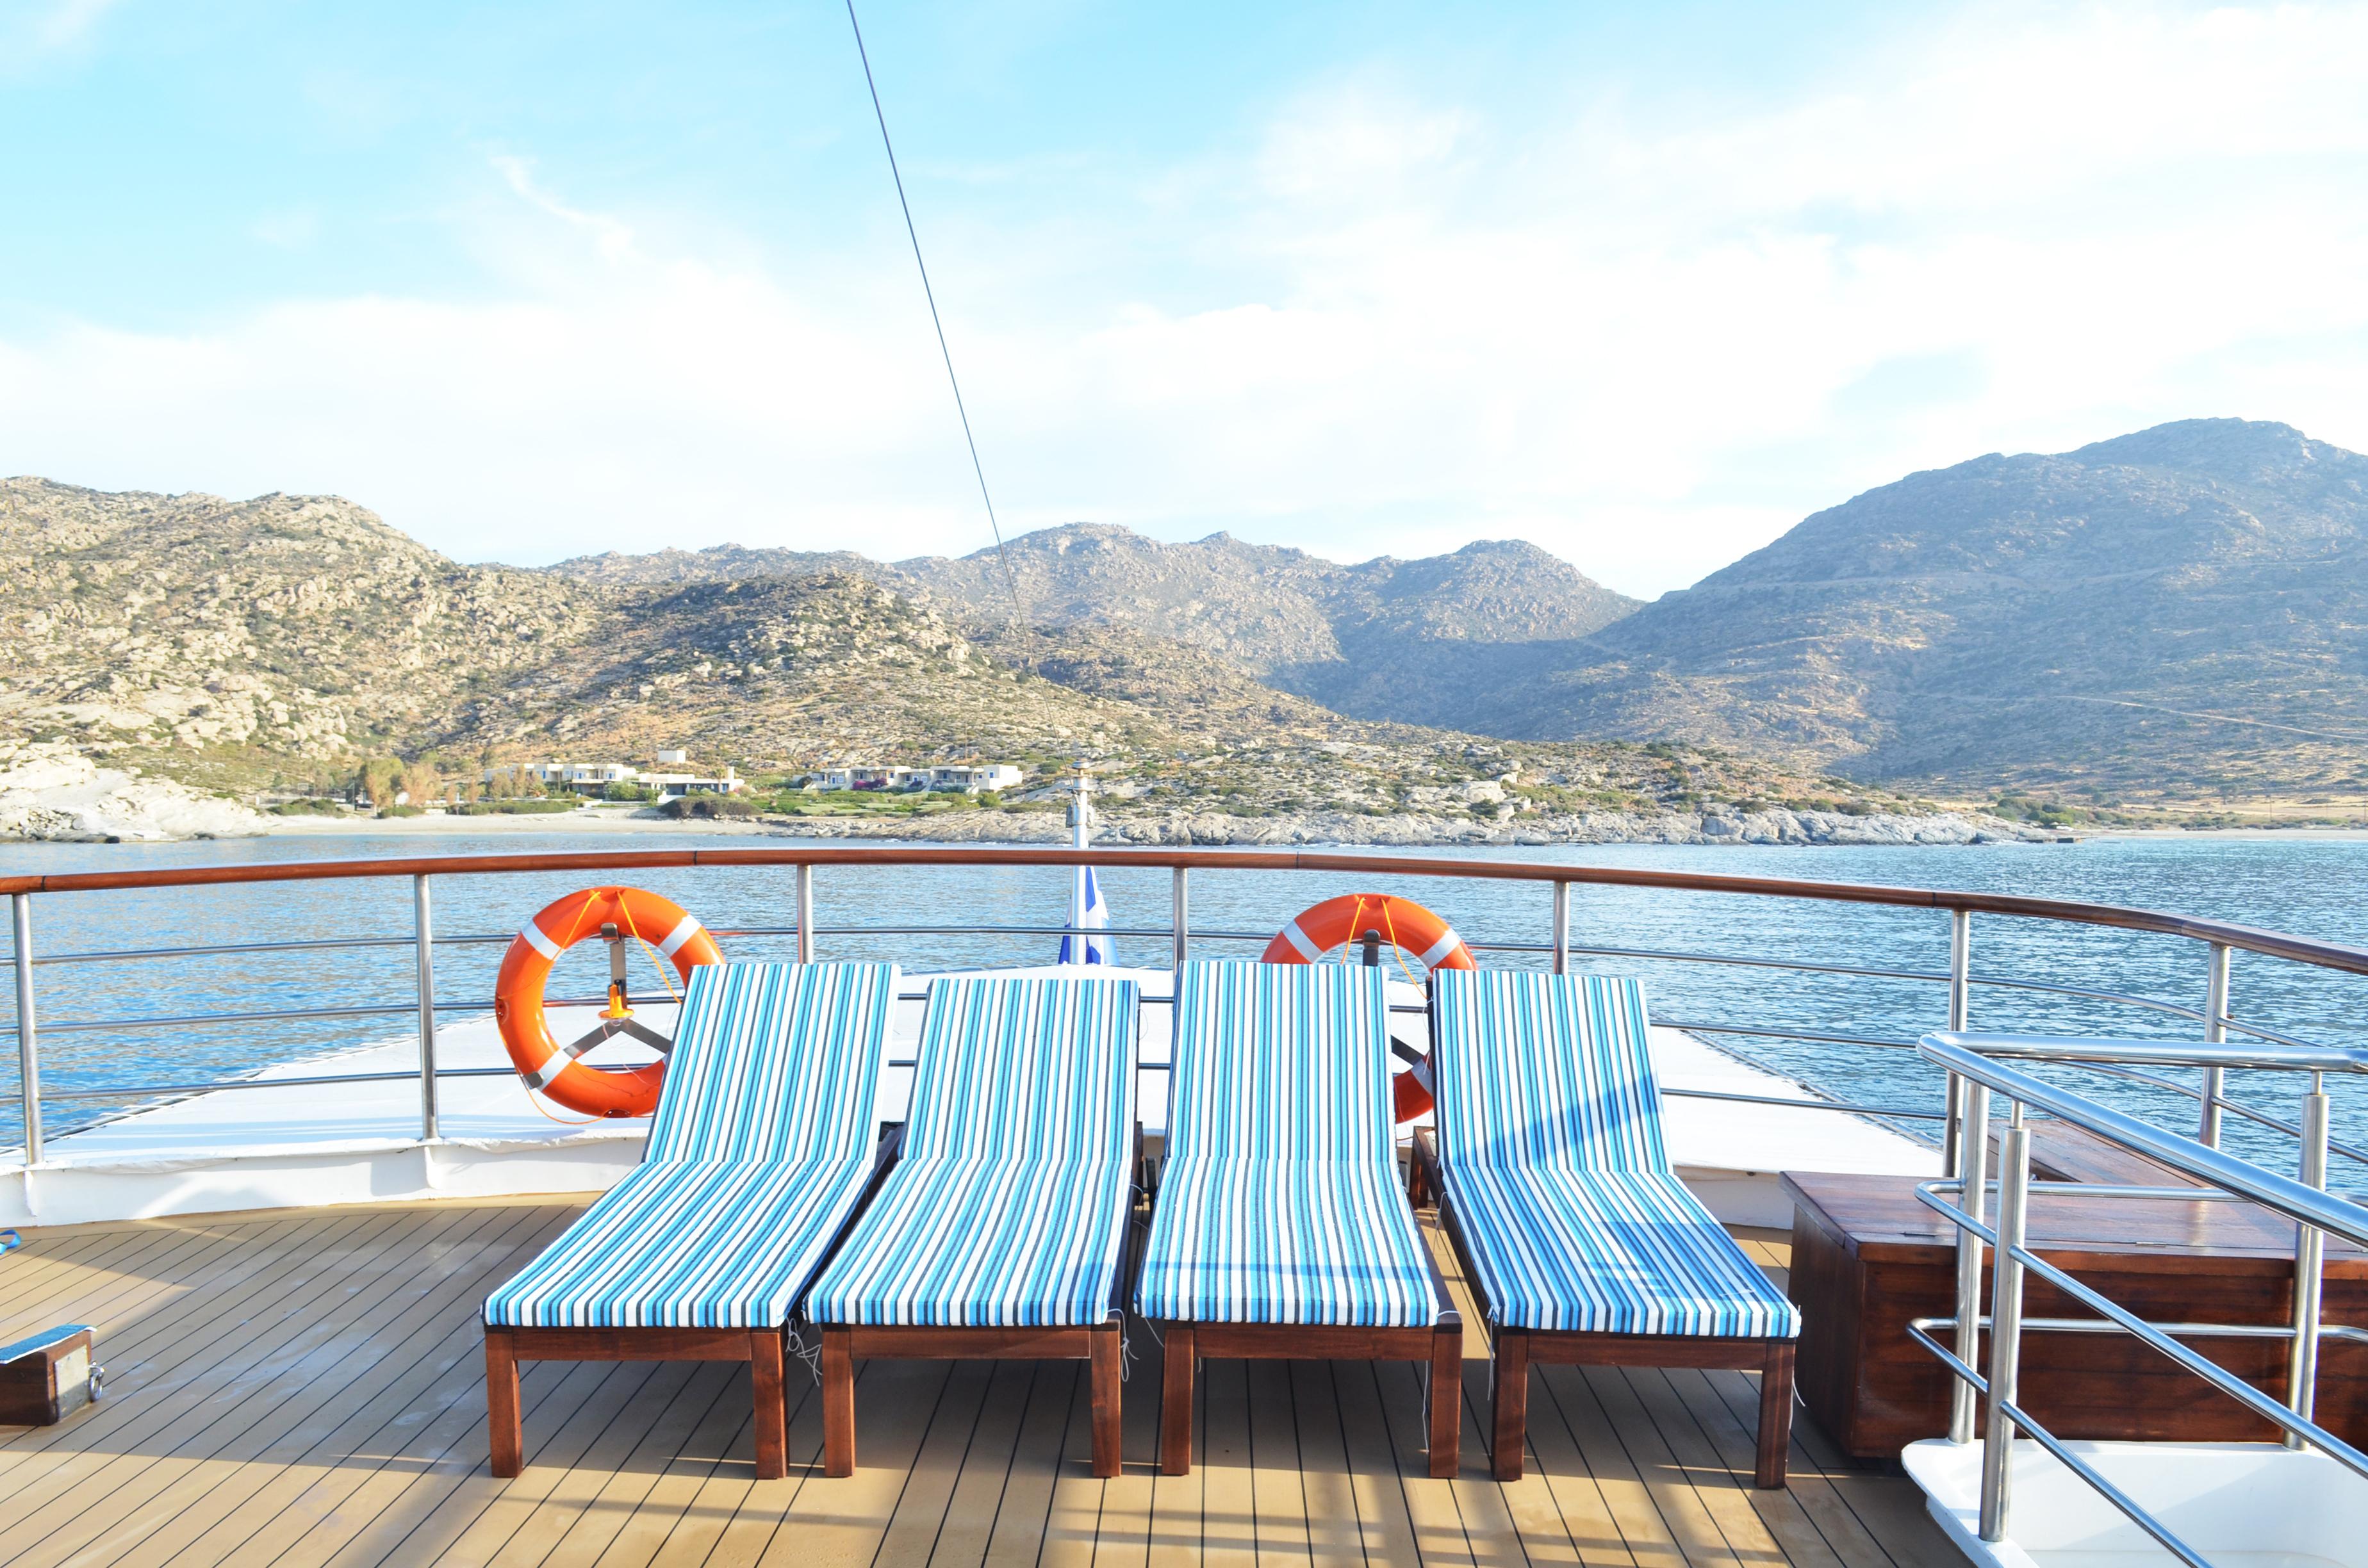 M/Y Callisto sun deck outdoor lounge yacht cruise Cuba ship